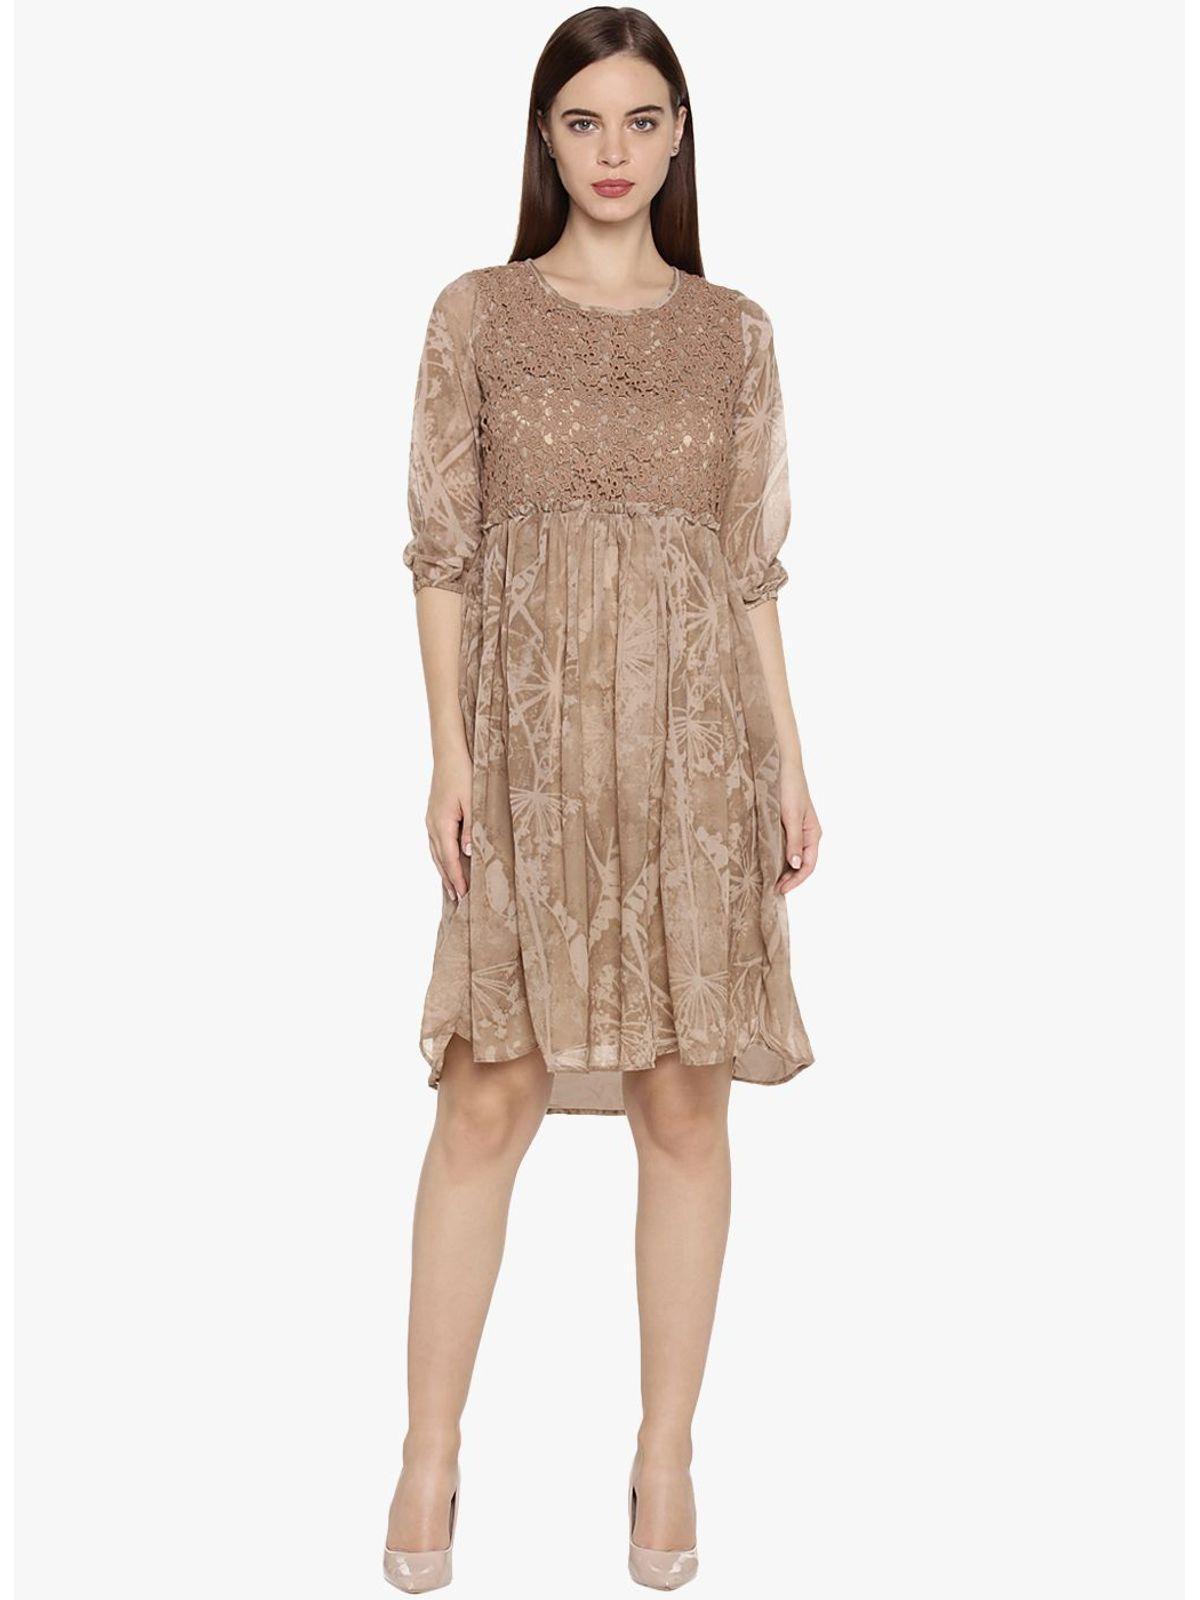 ANABEL PRINTED GGT DRESS